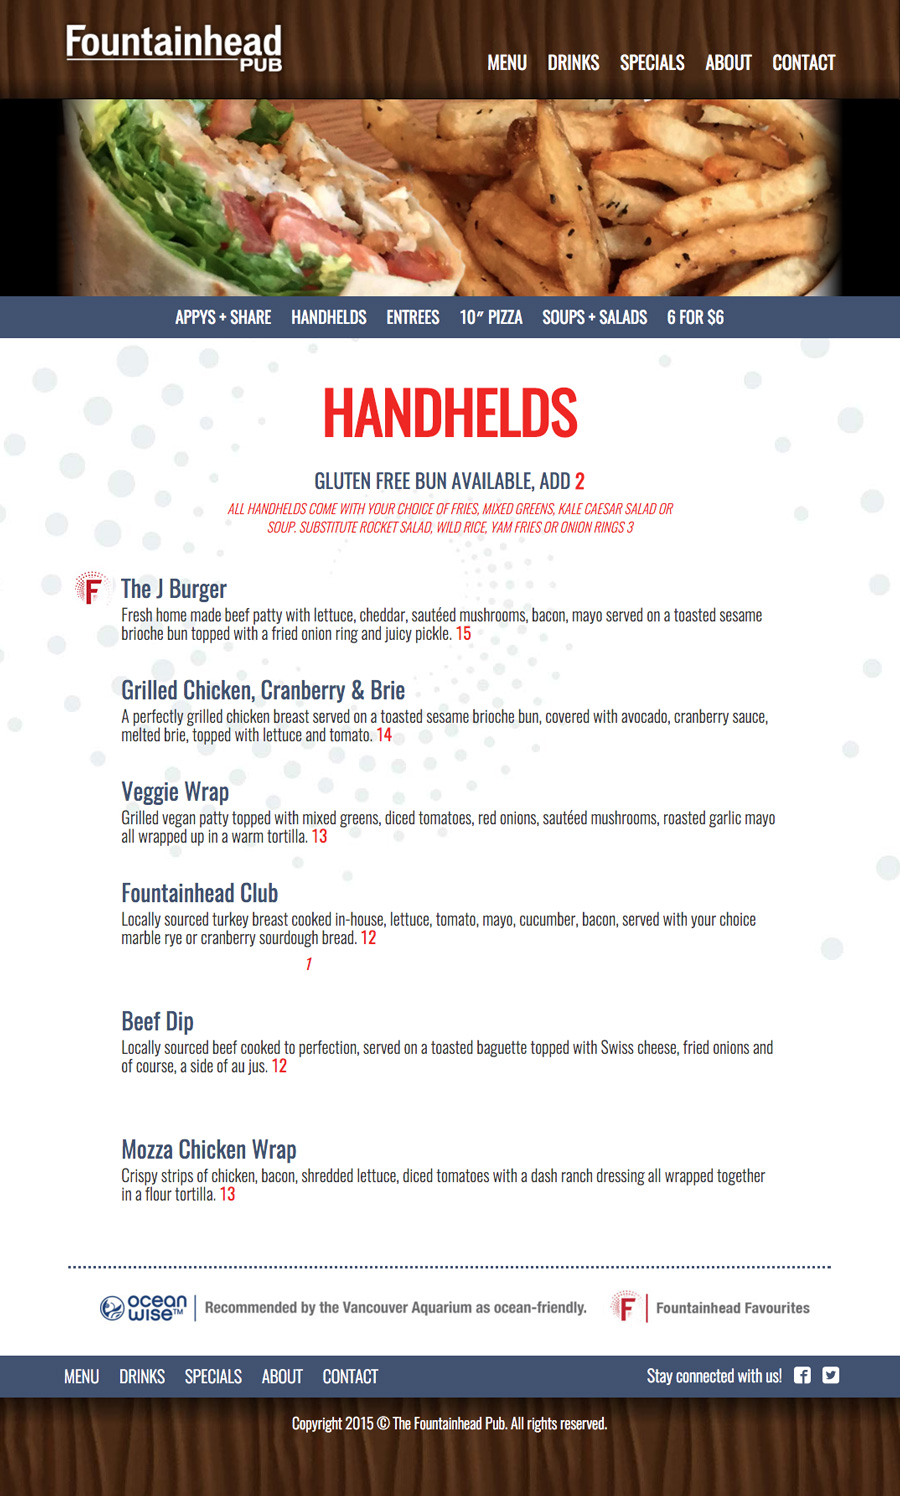 The Fountainhead Pub Website - Food Menu Item